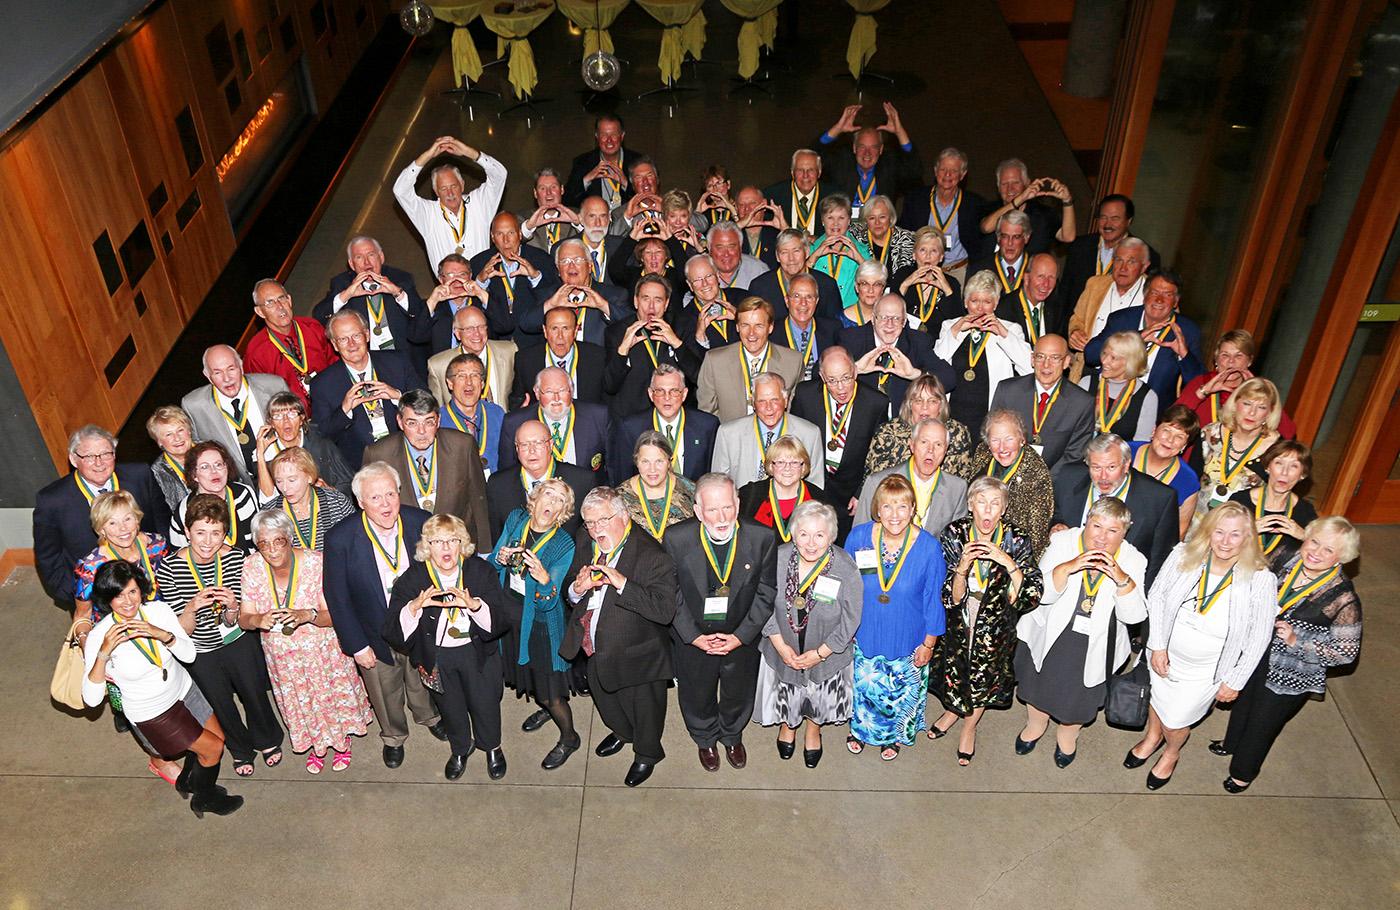 Alumni throw the O at the 50th Reunion